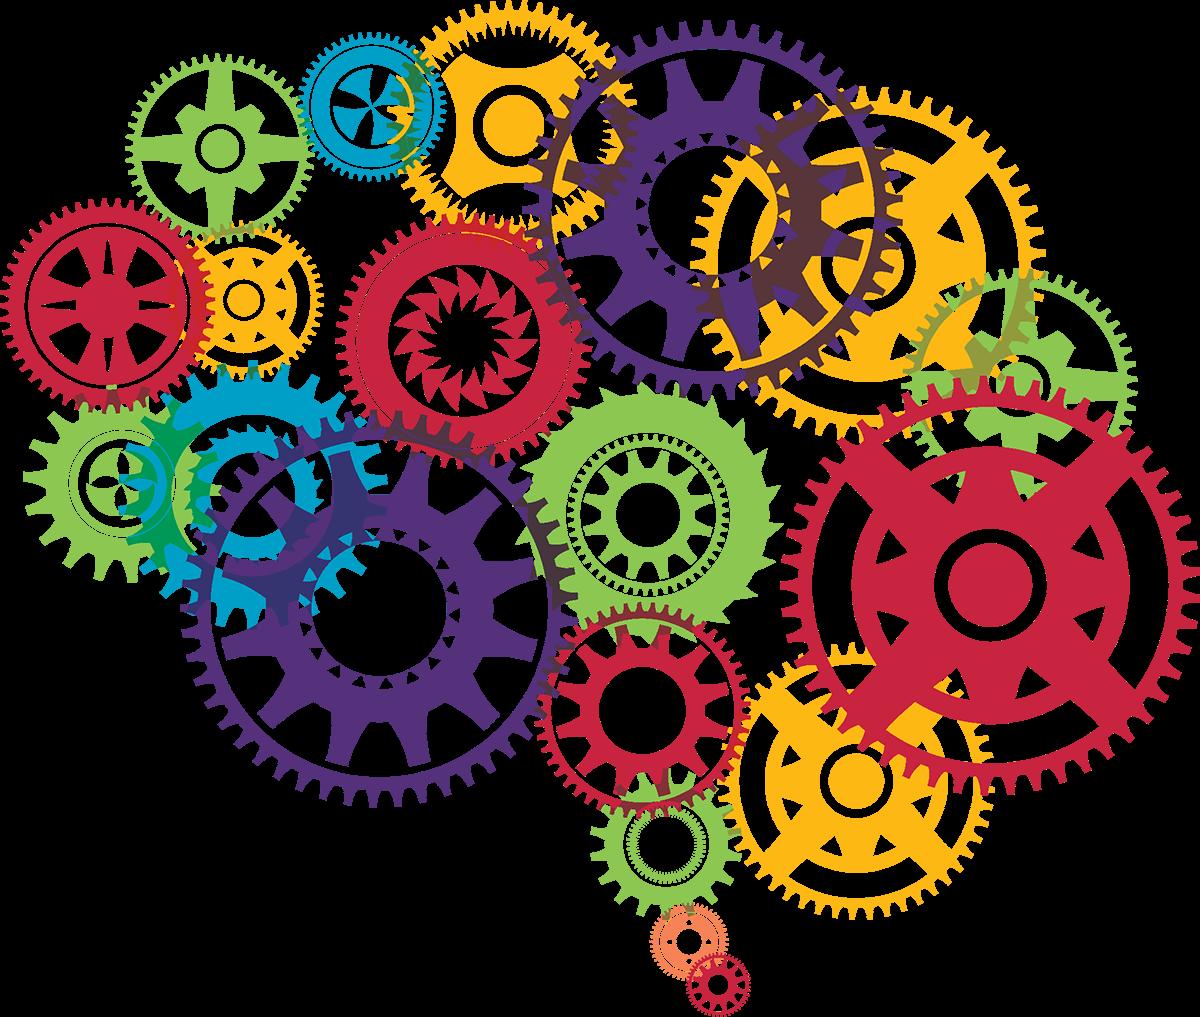 Frontiers in human neuroscience. Psychology clipart neurology